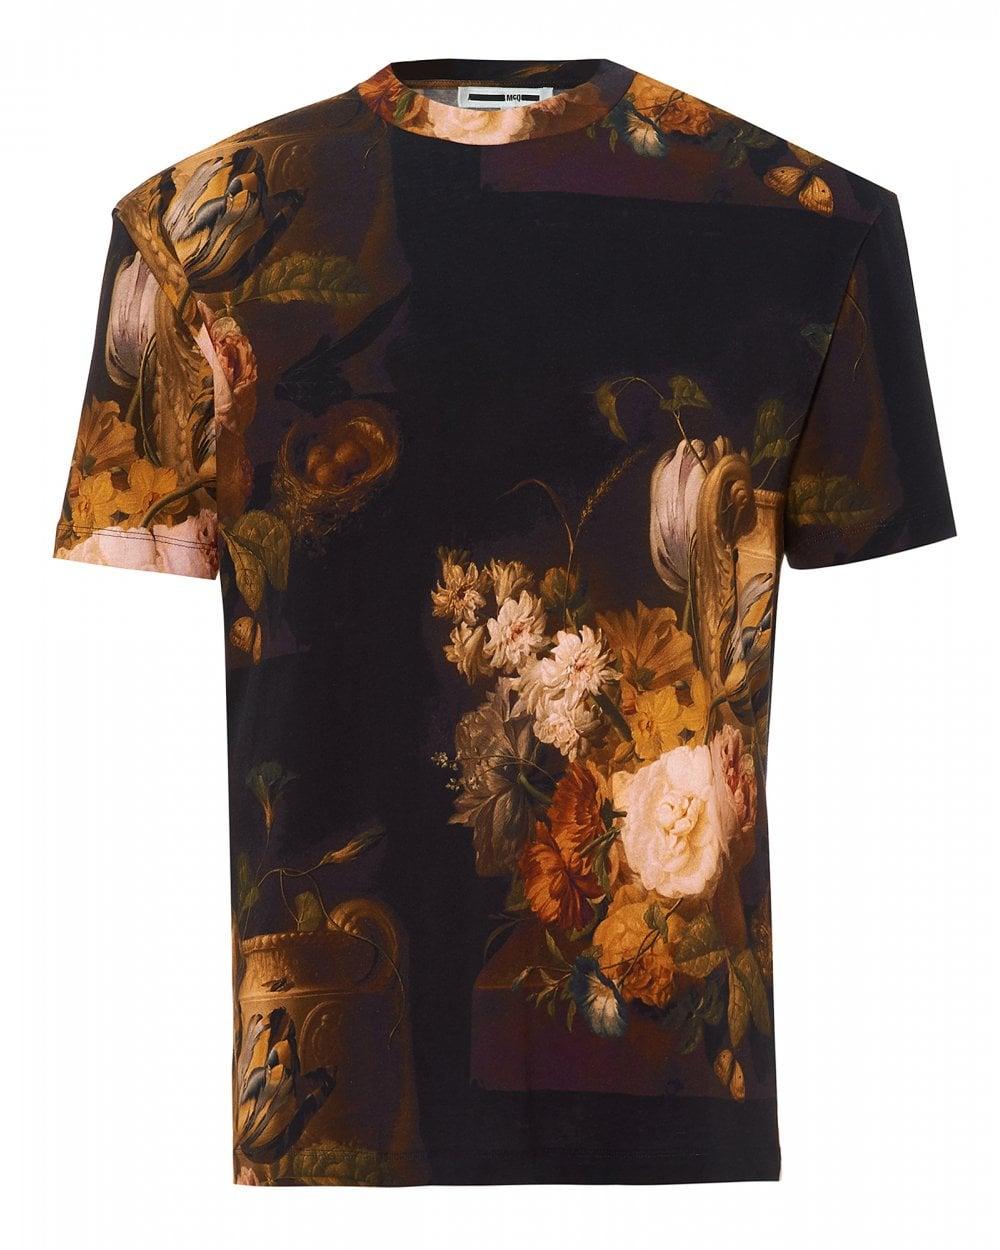 McQ by Alexander McQueen Mens Dutch Masters Floral Multi T-Shirt b869192f1db